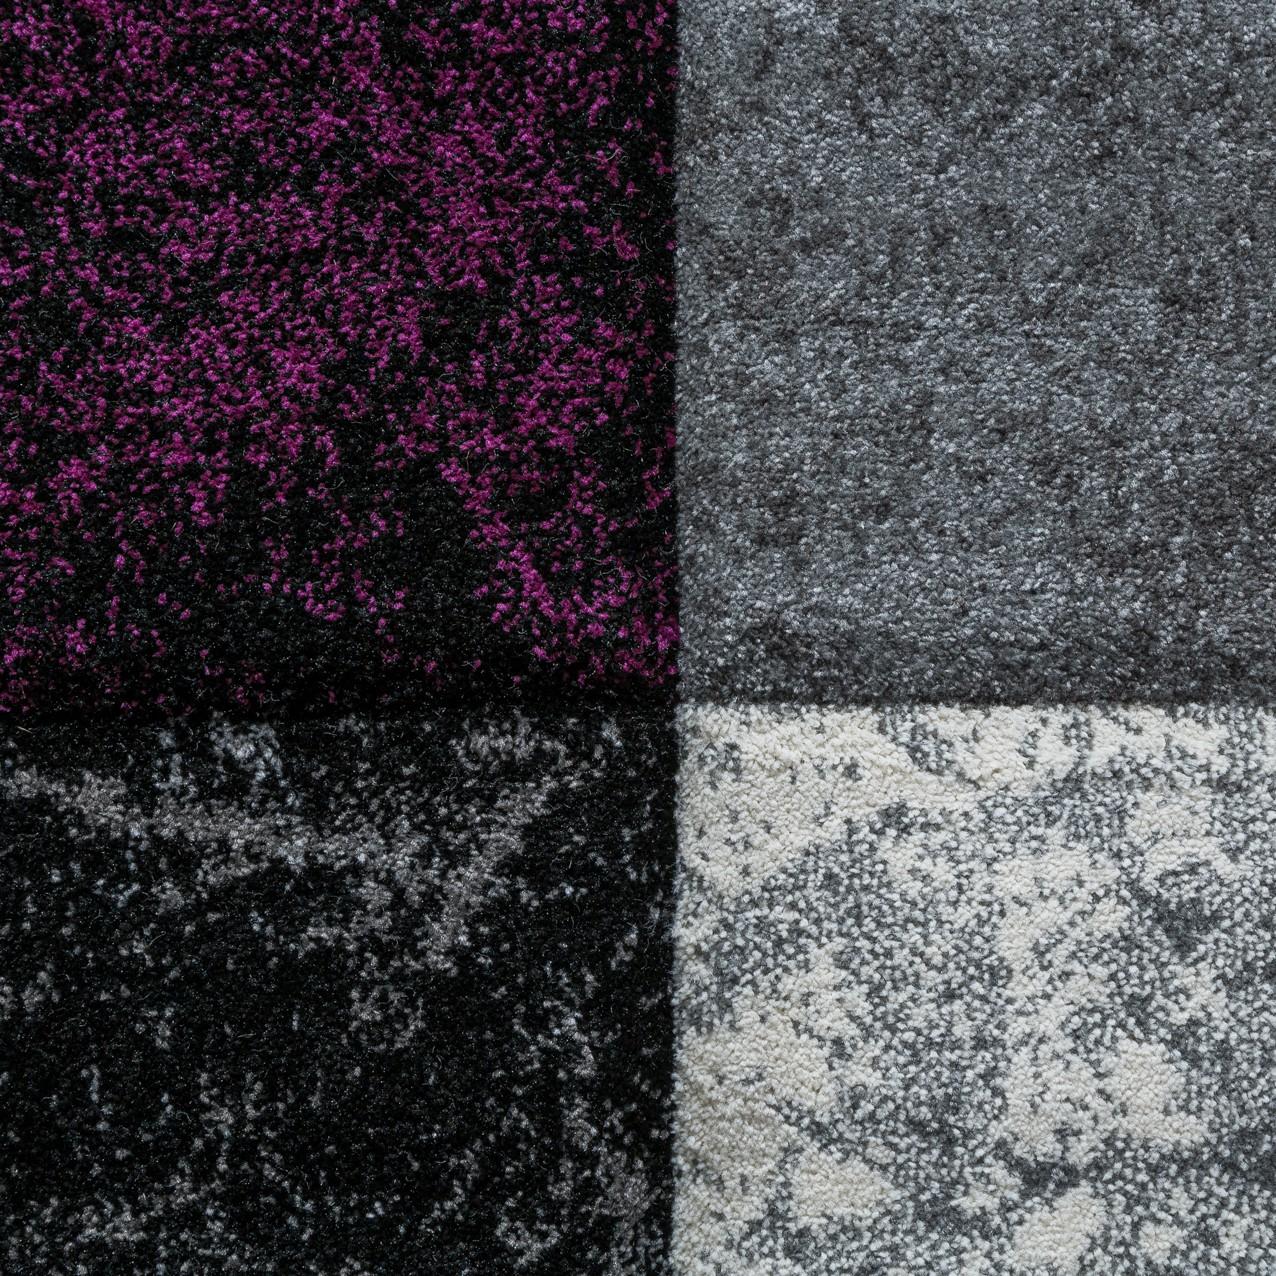 designer teppich valencia modern mit marmor optik kariert meliert lila grau wei moderne teppiche. Black Bedroom Furniture Sets. Home Design Ideas